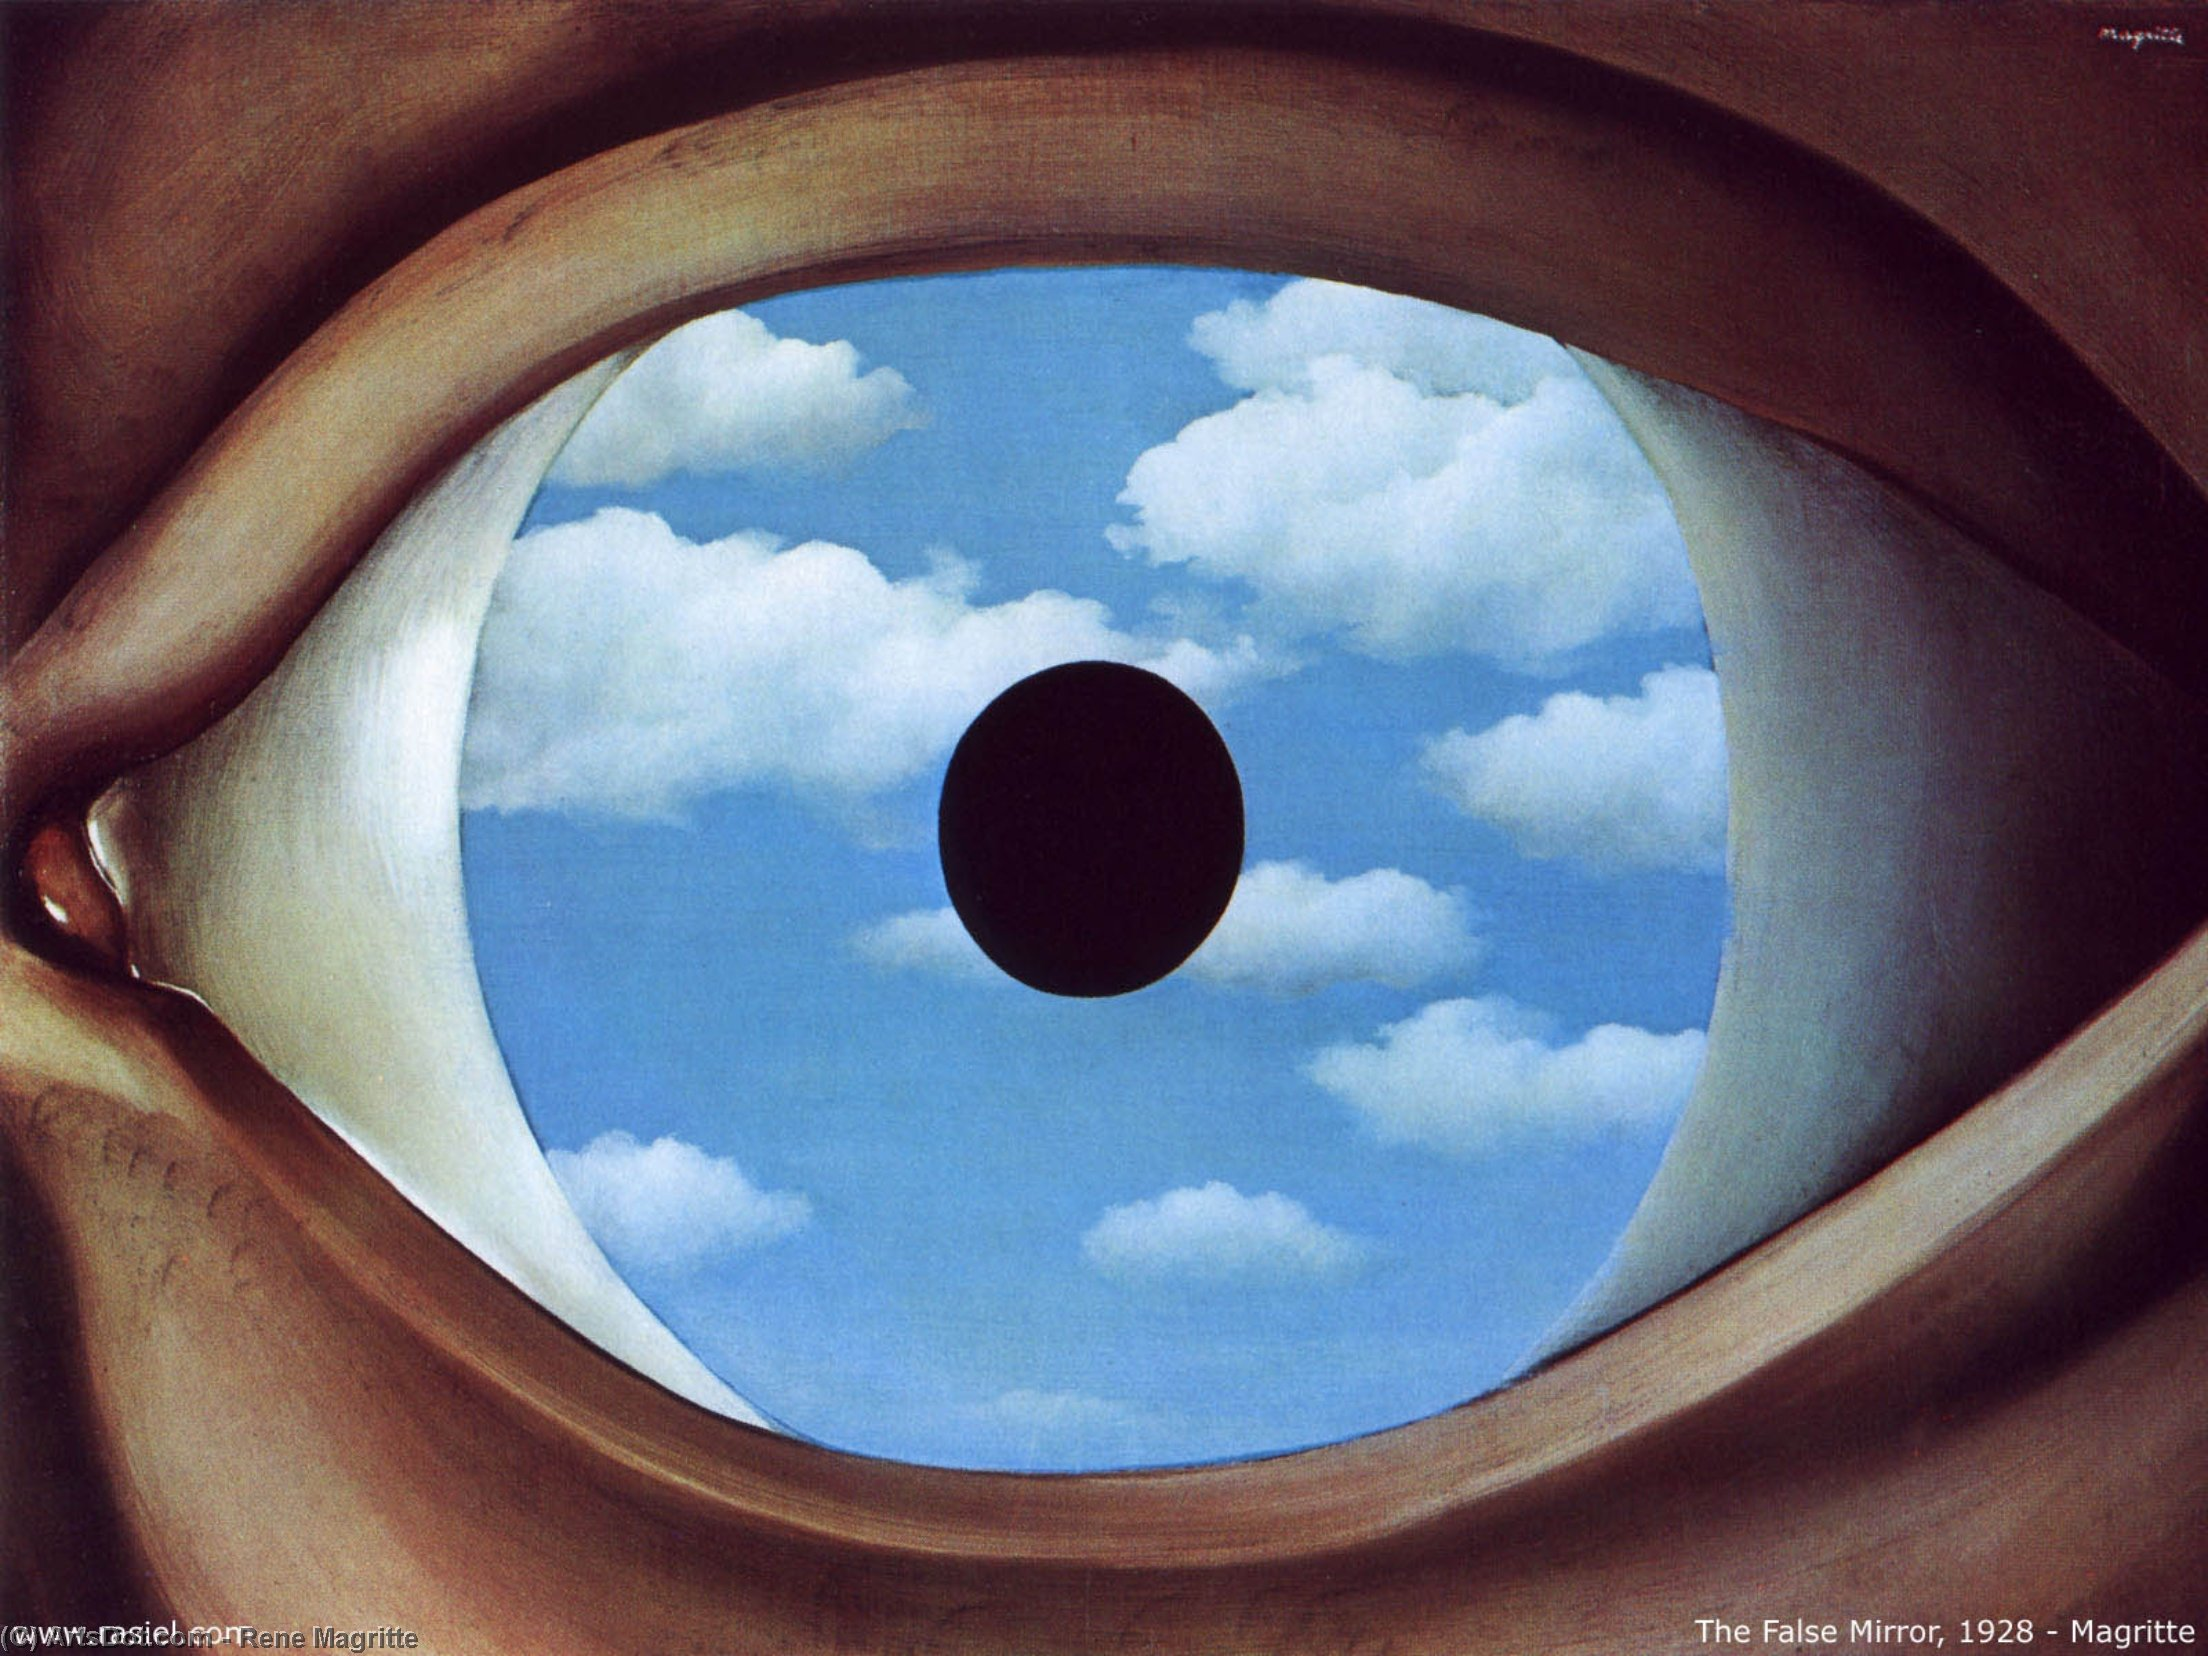 The false mirror - Rene Magritte